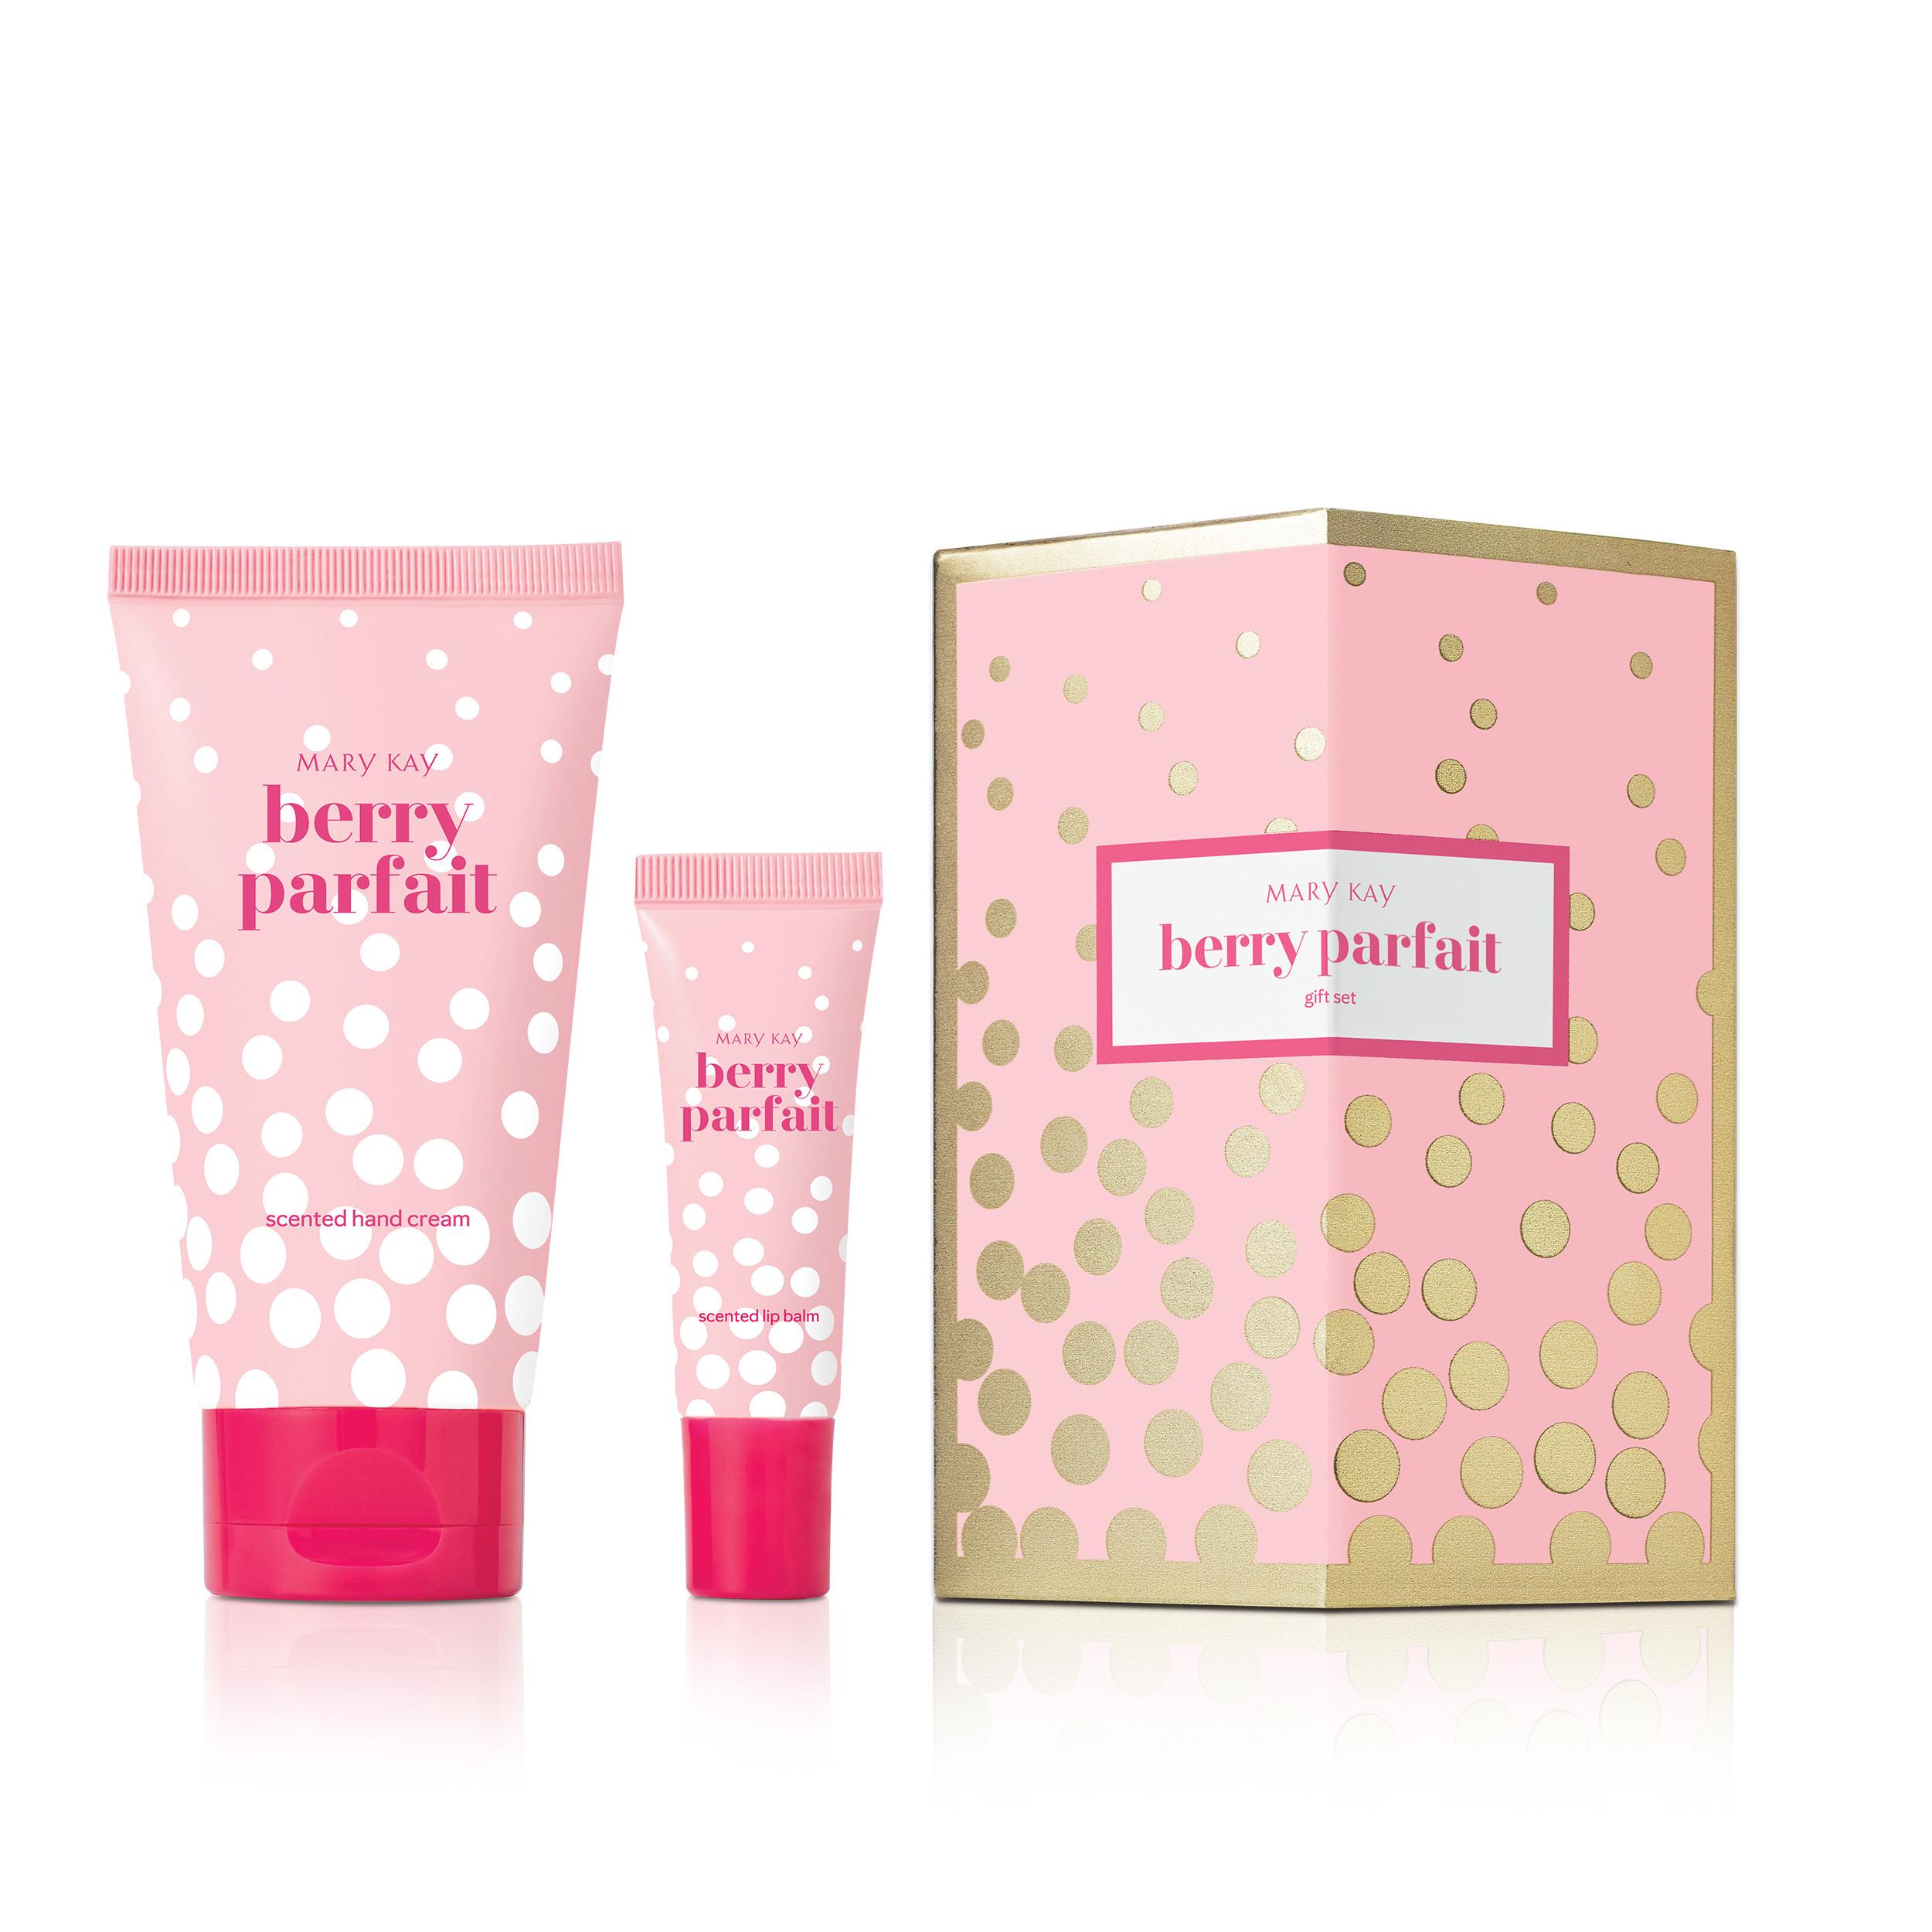 Darling Delights™ նվեր-հավաքածու. ձեռքերի քսուք և շուրթերի բալզամ